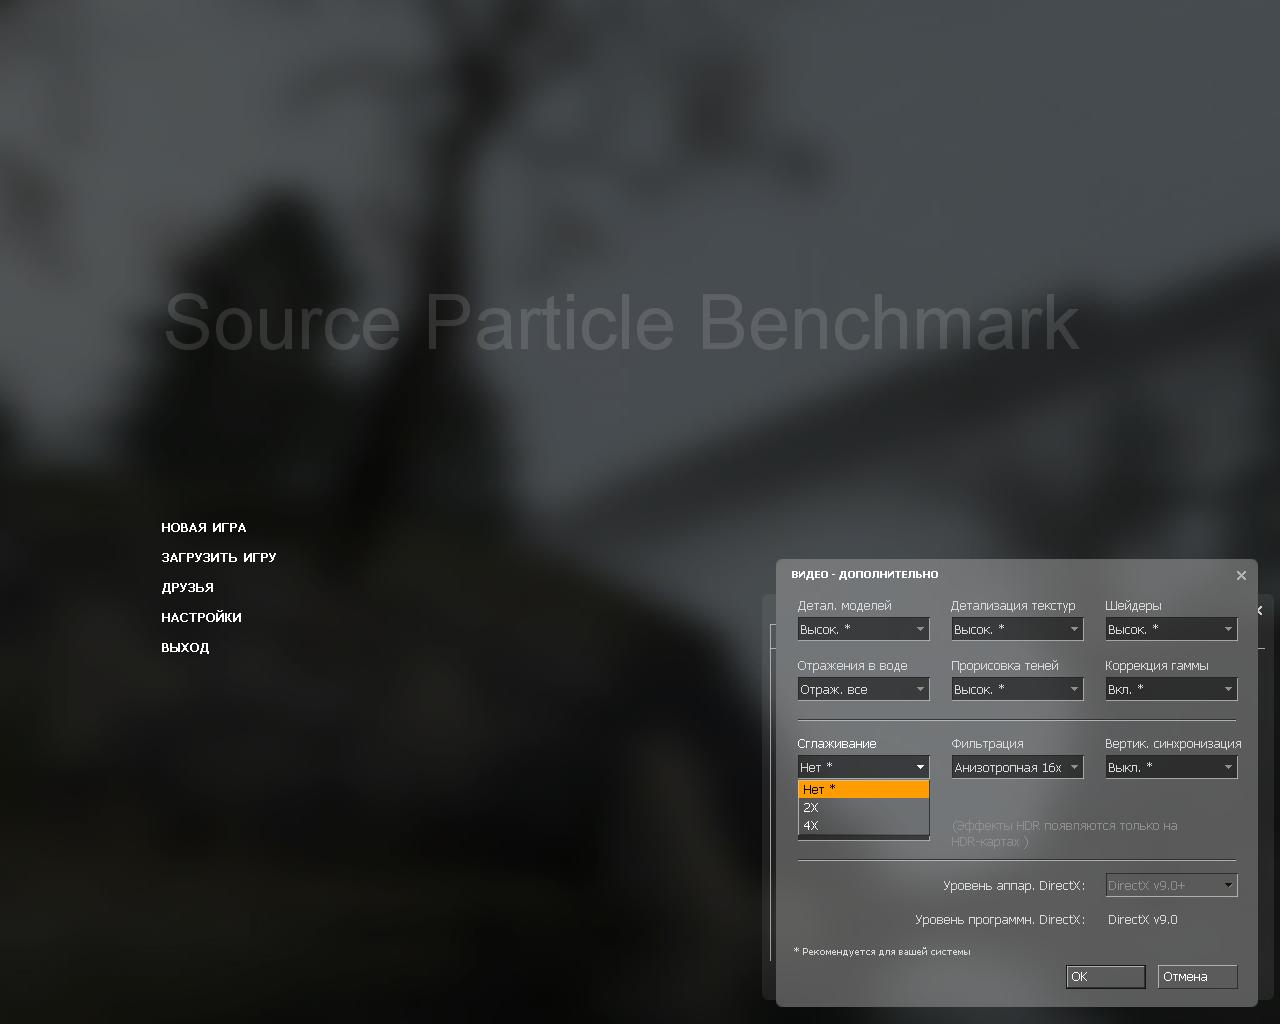 Multicore CPU Particle Simulation Benchmark - Half-Life 2 benchmark, Ep1, Ep2, particles, Source, Source 7, слайдшоу